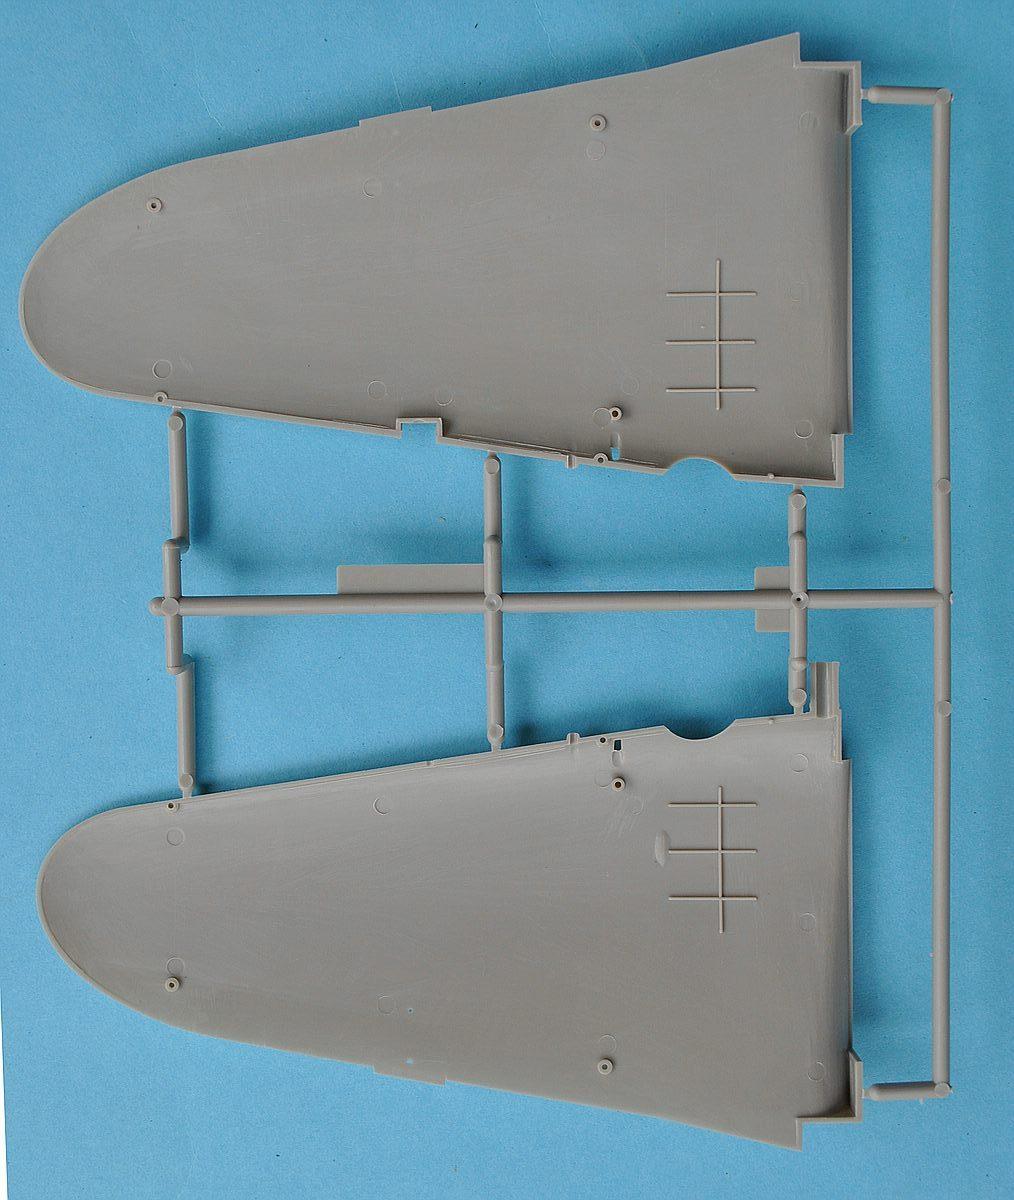 Revell-03932-Il-2-Stormovik-57 Iljuschin Il-2 in 1:48 von Revell (03932)